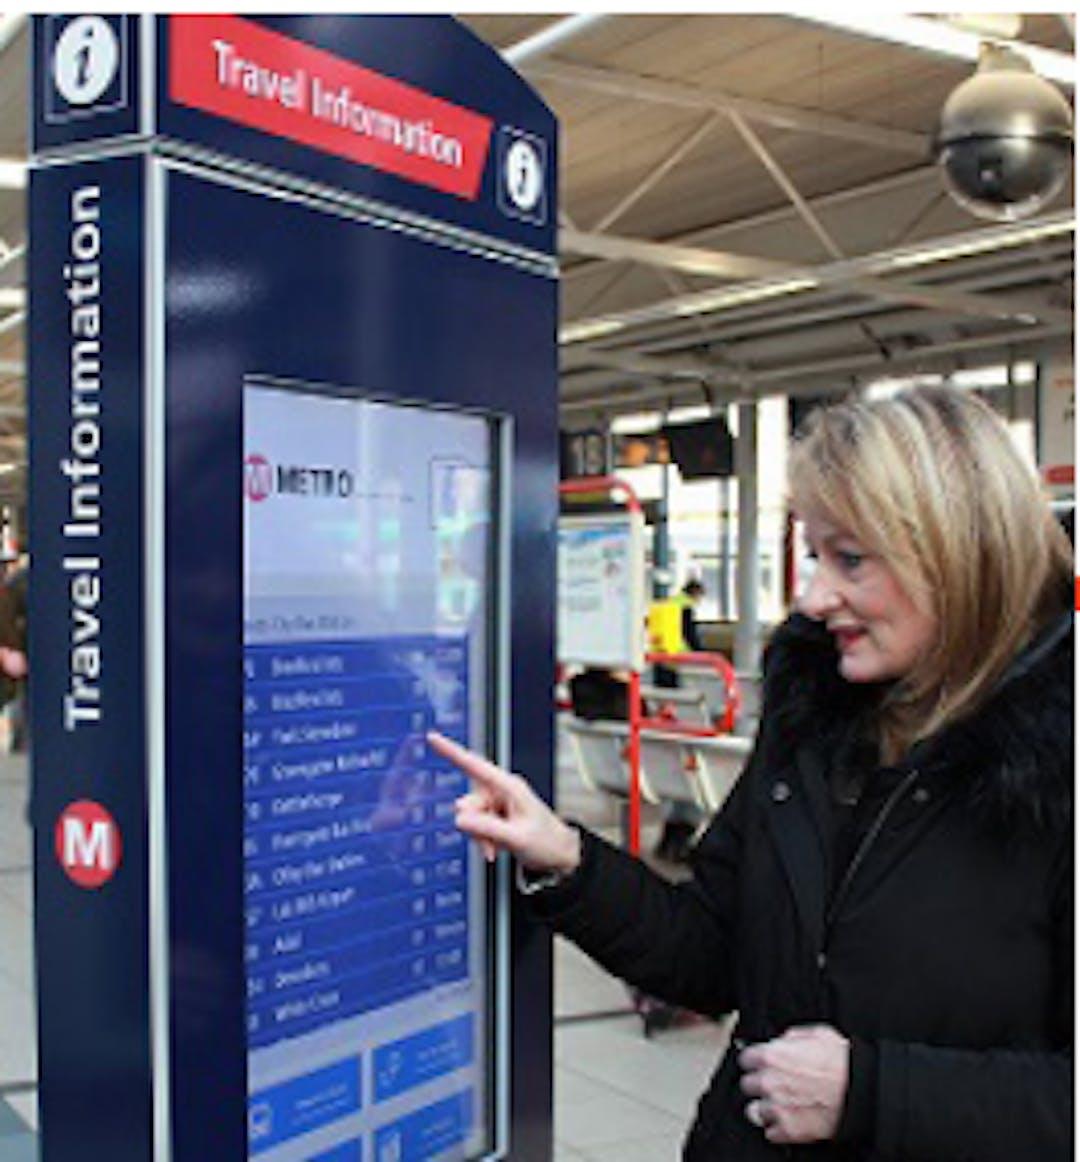 Bus info box